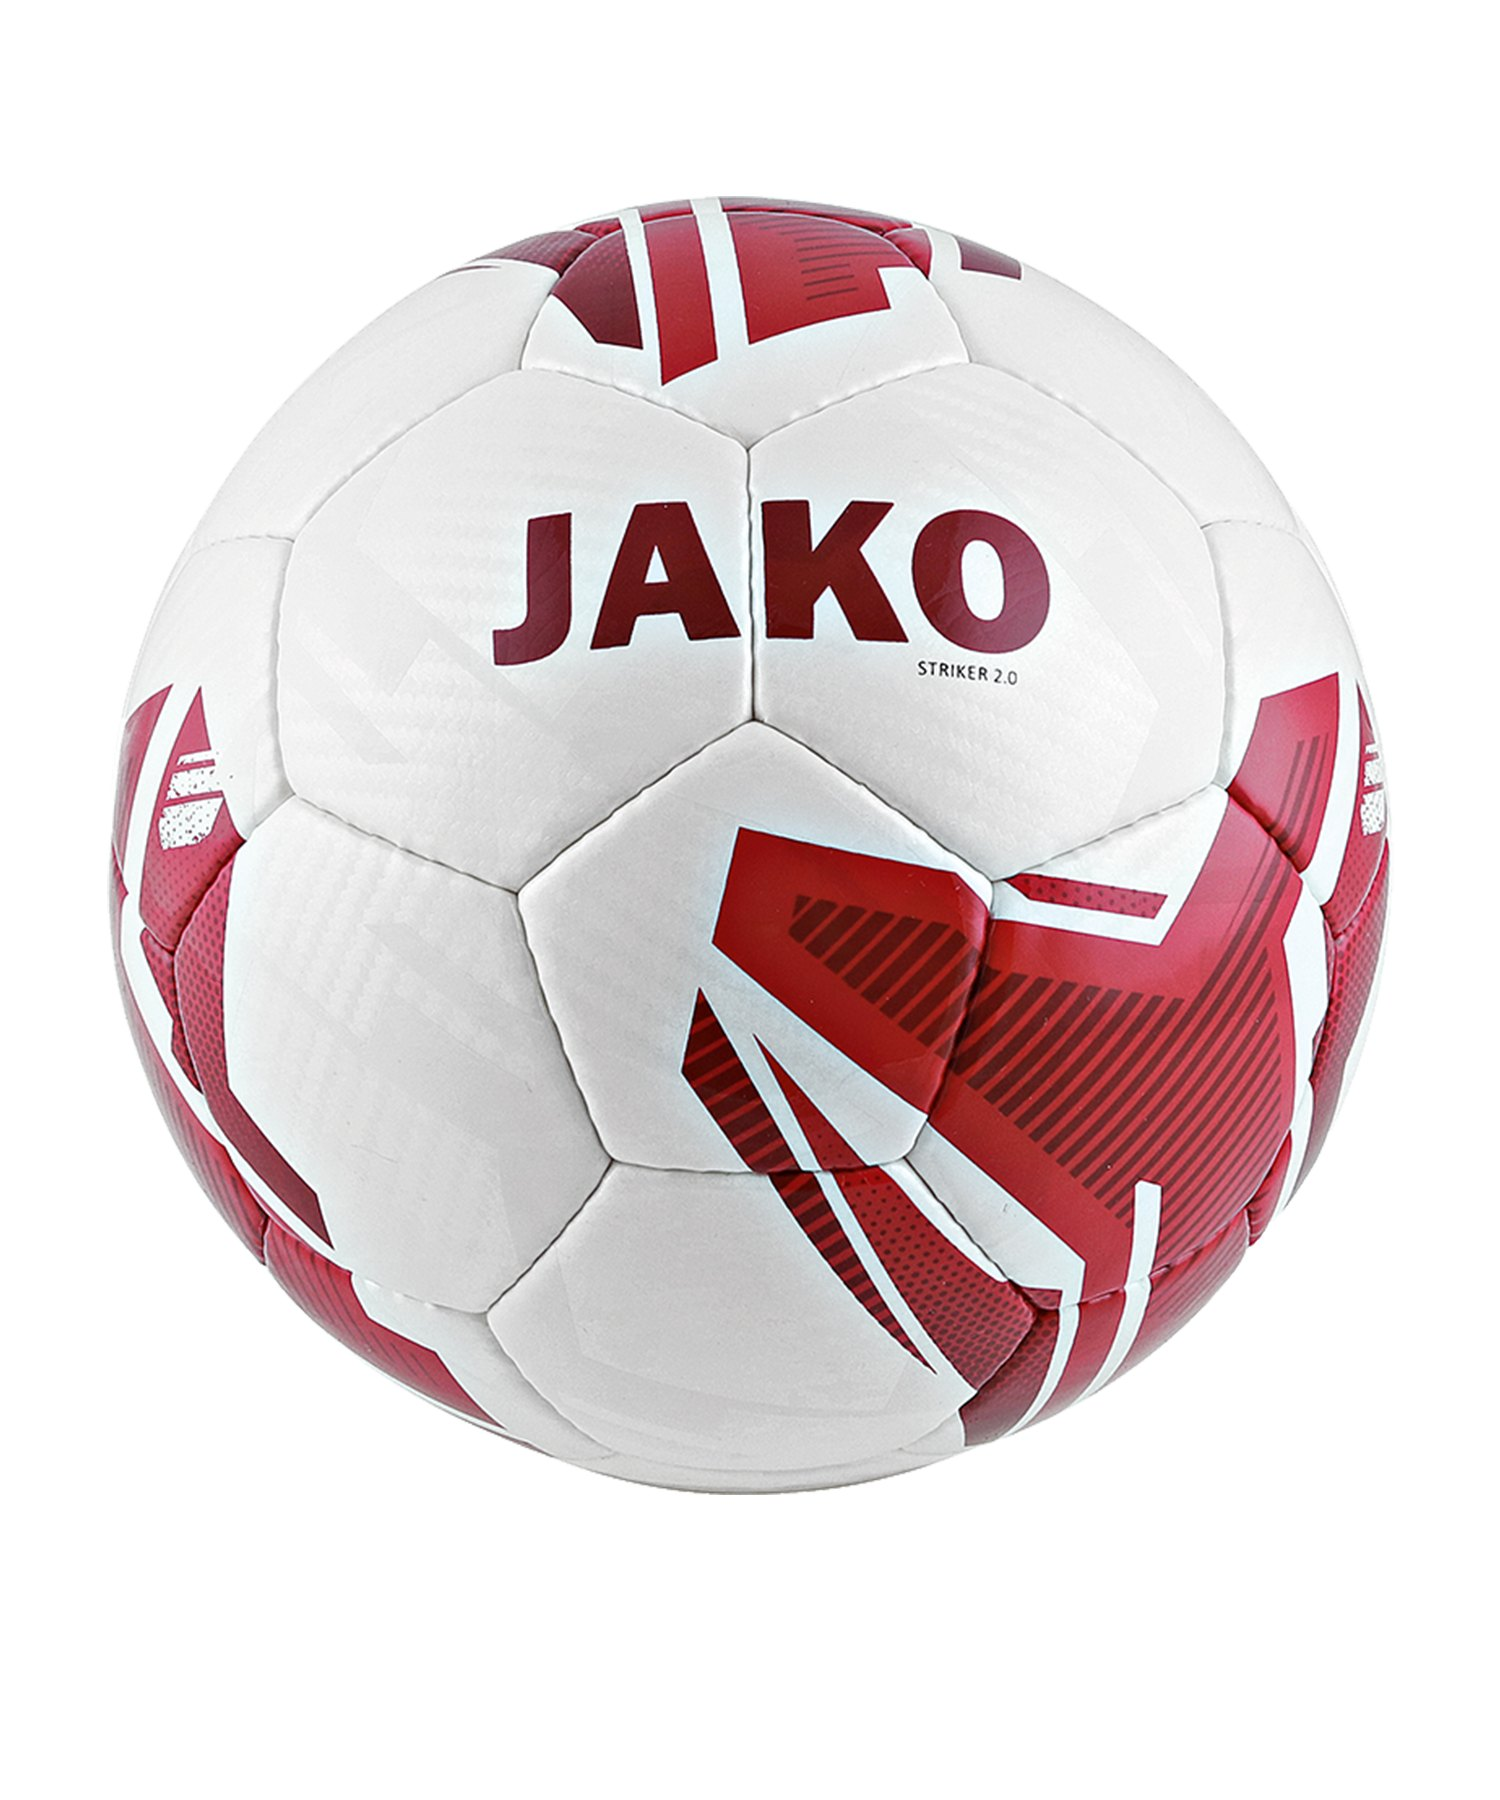 Jako Striker 2.0 Lightball HS 350 Gramm Gr. 5 F04 - Blau